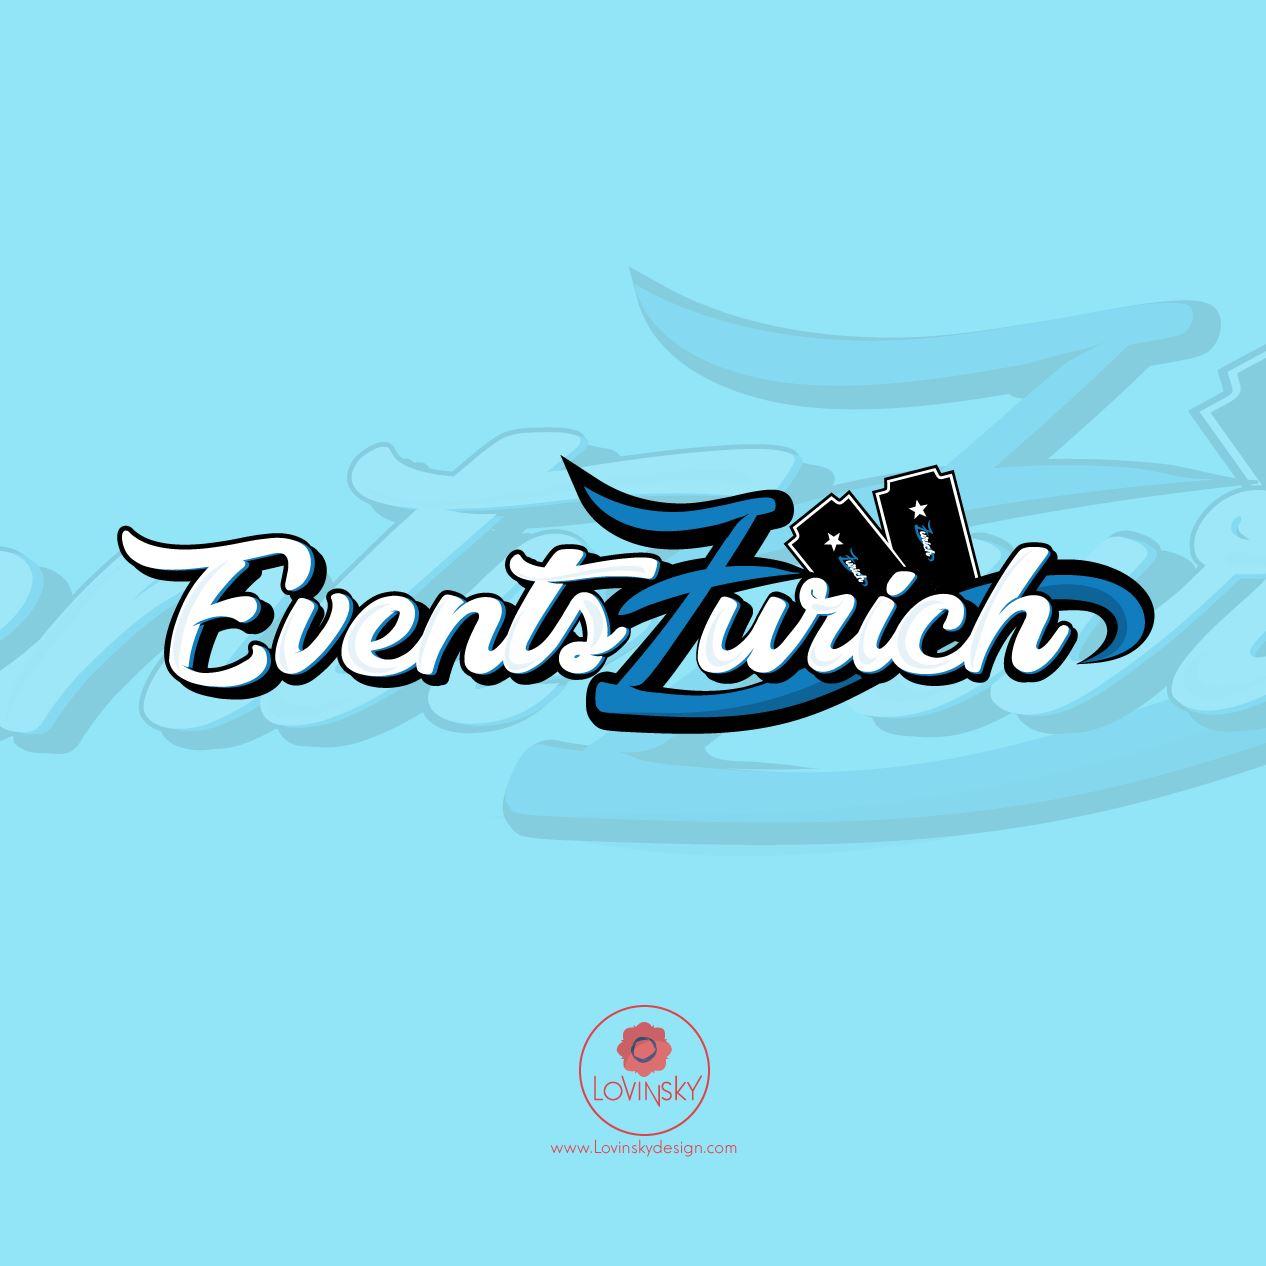 events-zurich logo lovinsky graphiste webdesigner freelance nantes 44